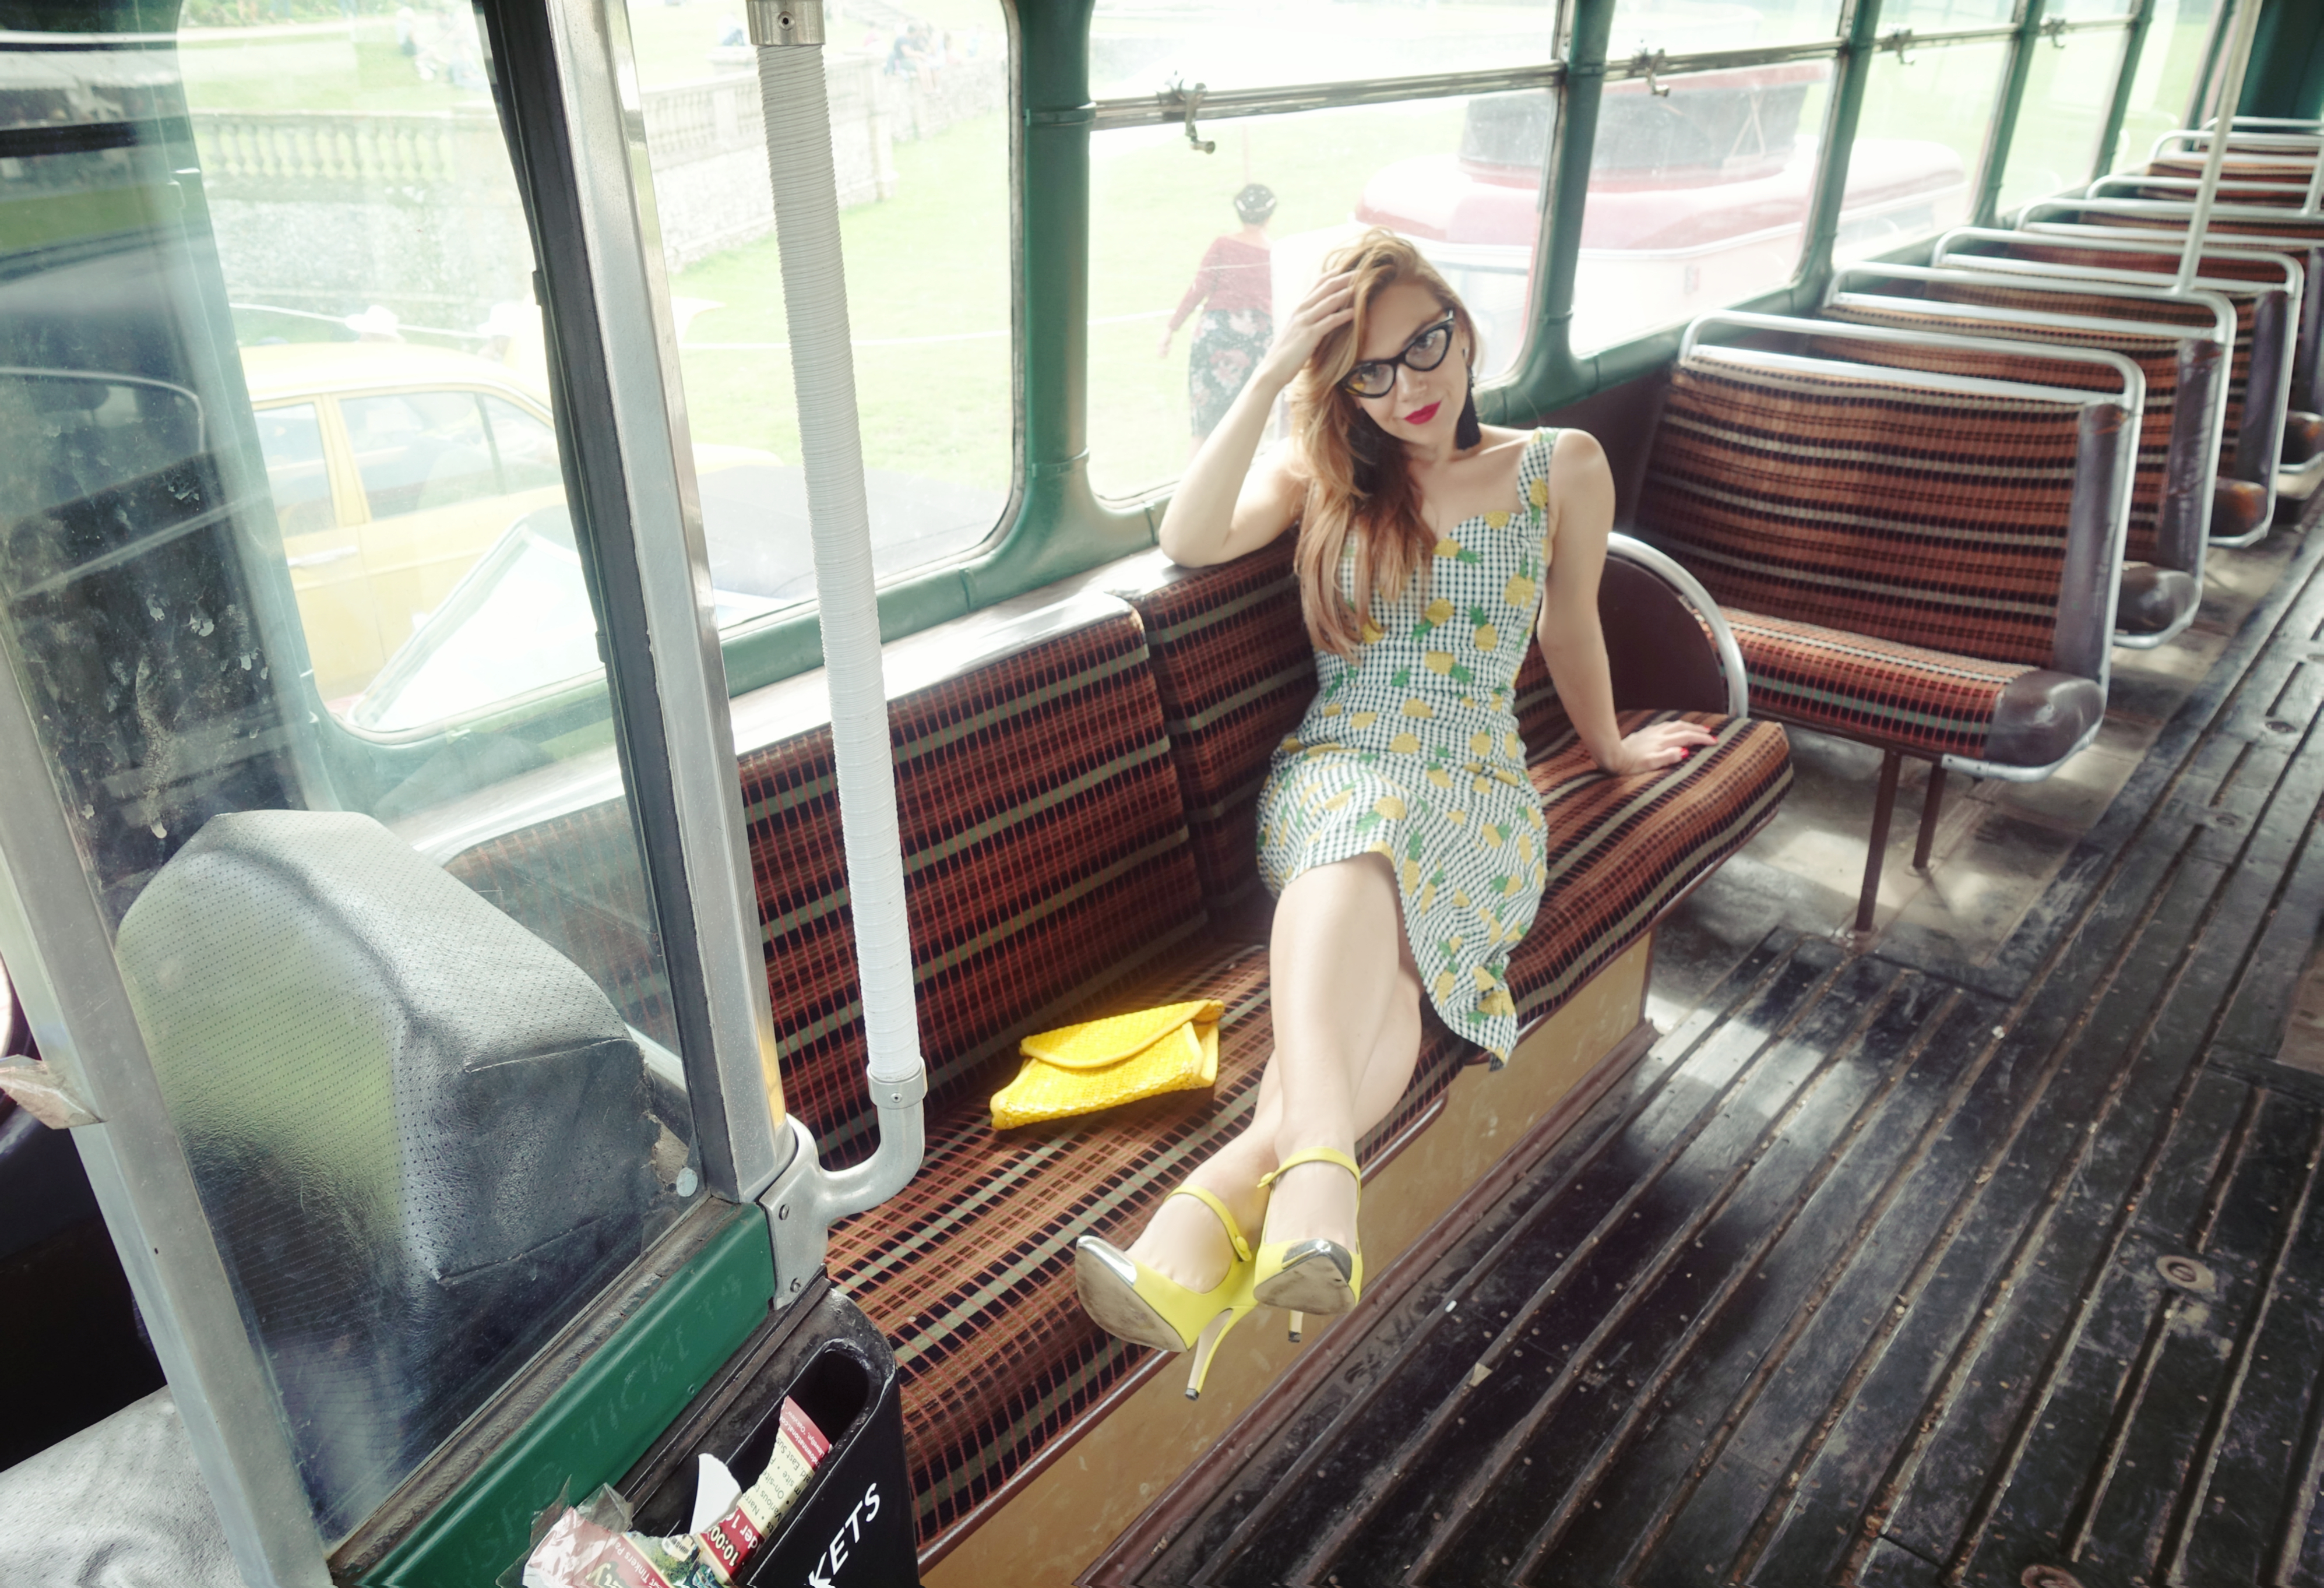 collectif-vintage-dress-blog-de-moda-ChicAdicta-influencer-PiensaenChic-pineapple-look-Chic-adicta-london-to-brighton-Piensa-en-Chic